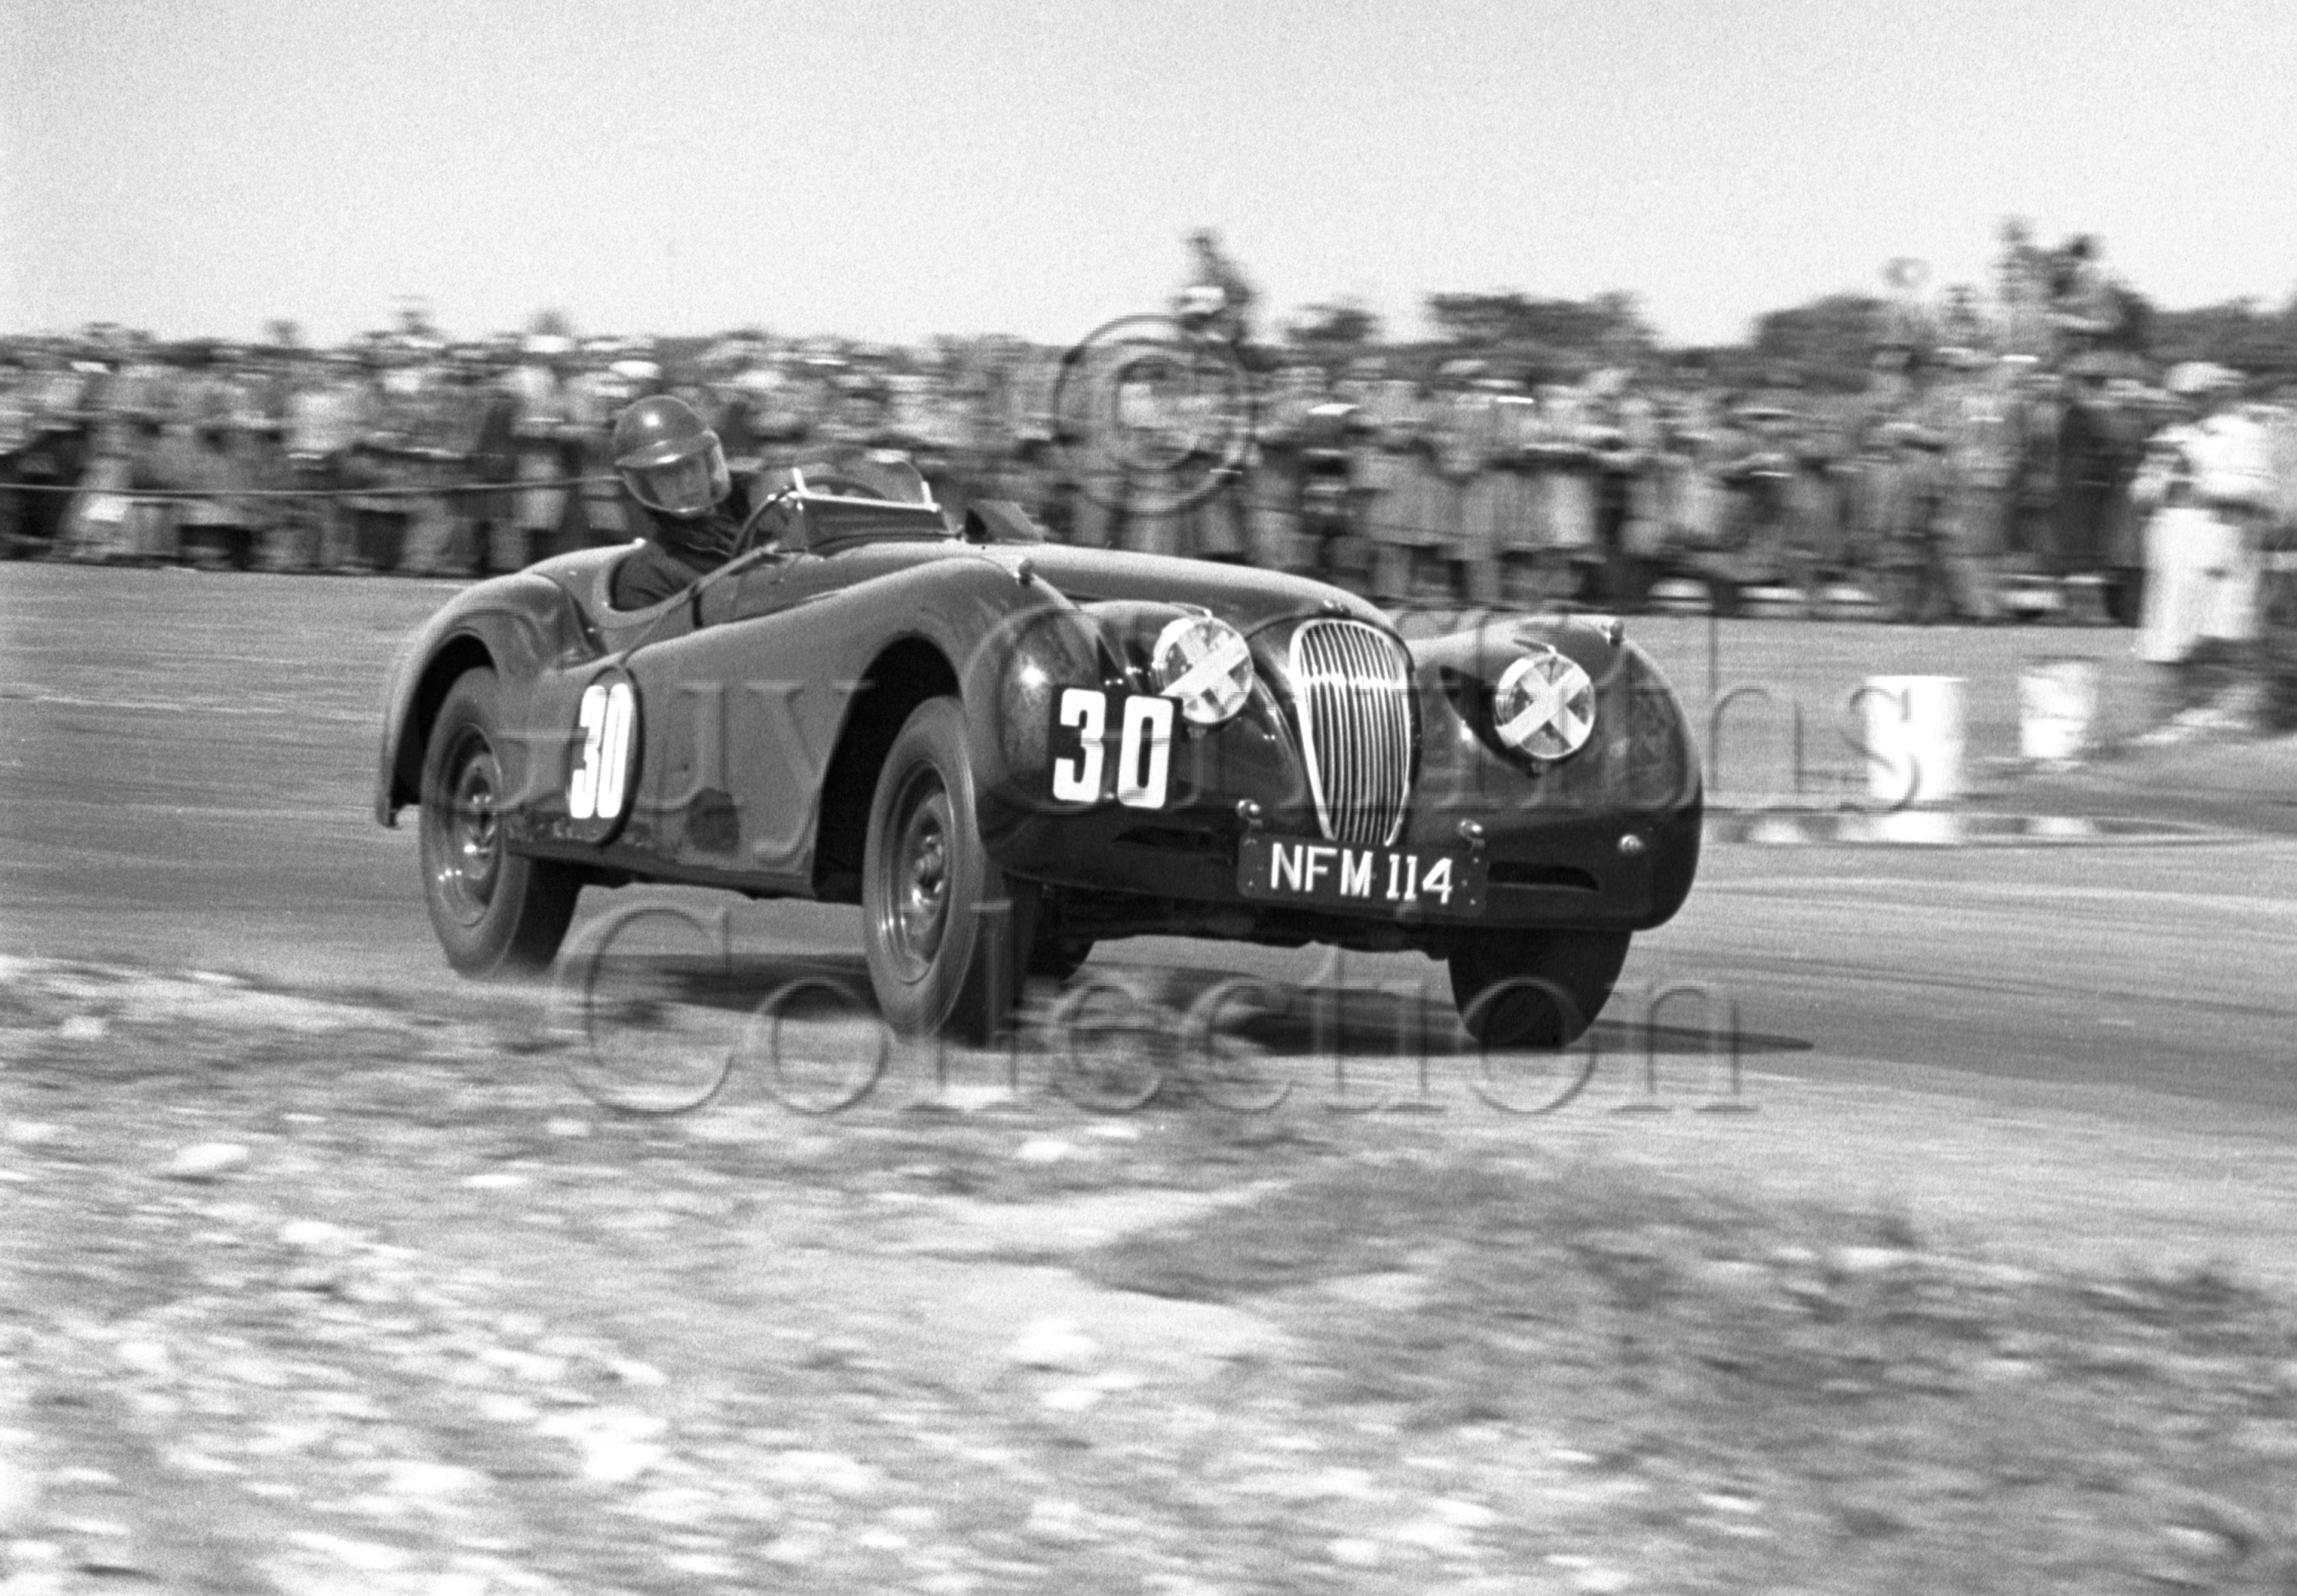 70-631–D-S-Boston–Jaguar–Snetterton–30-05-1953.jpg - The Guy Griffiths Collection